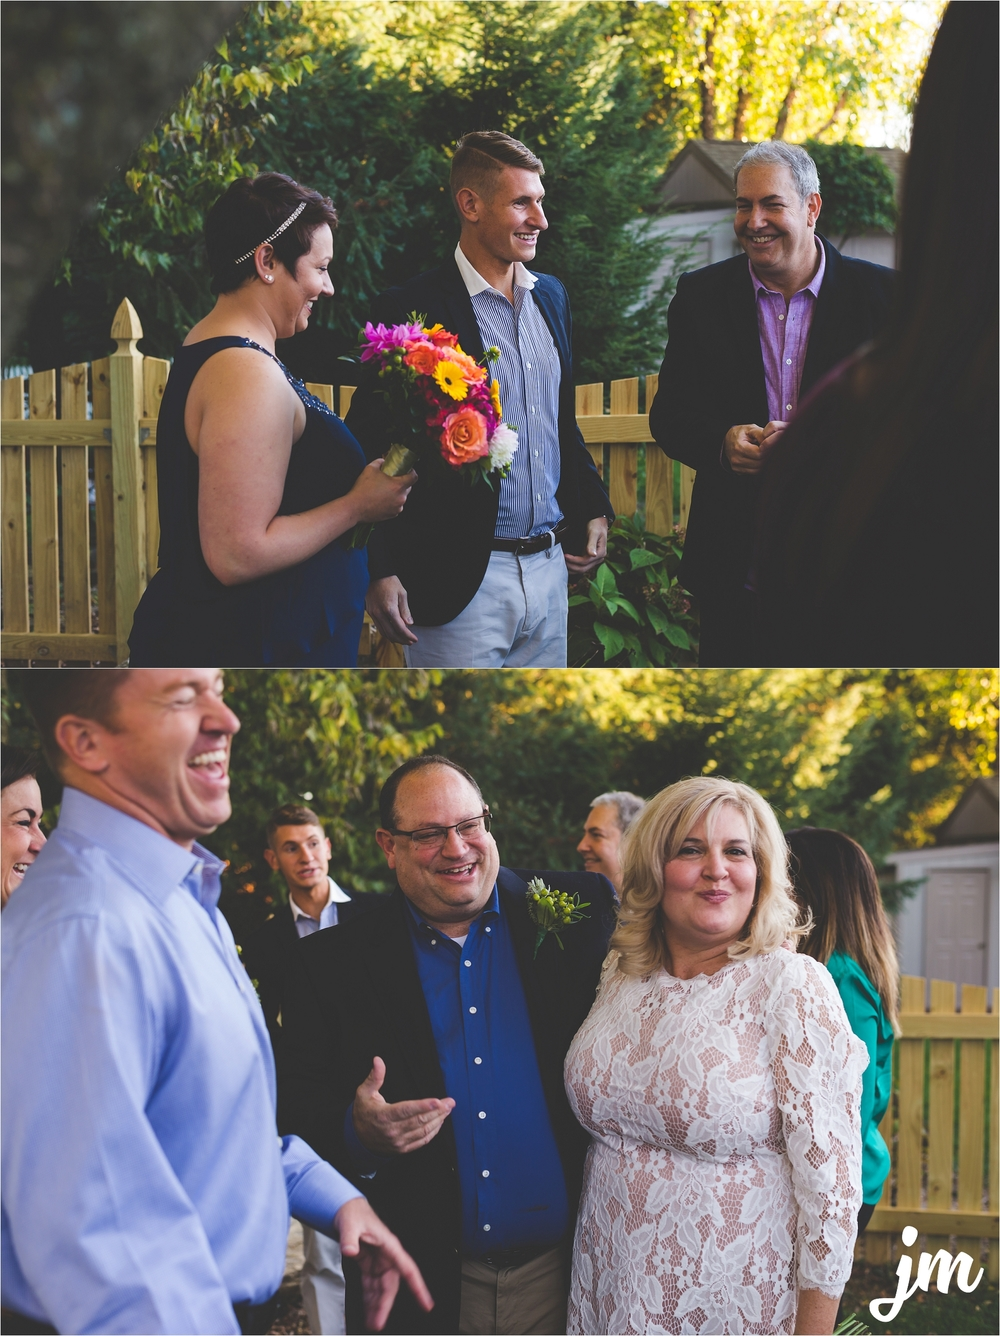 backyard-wedding-pacific-northwest-photographer-jannicka-mayte_0025.jpg